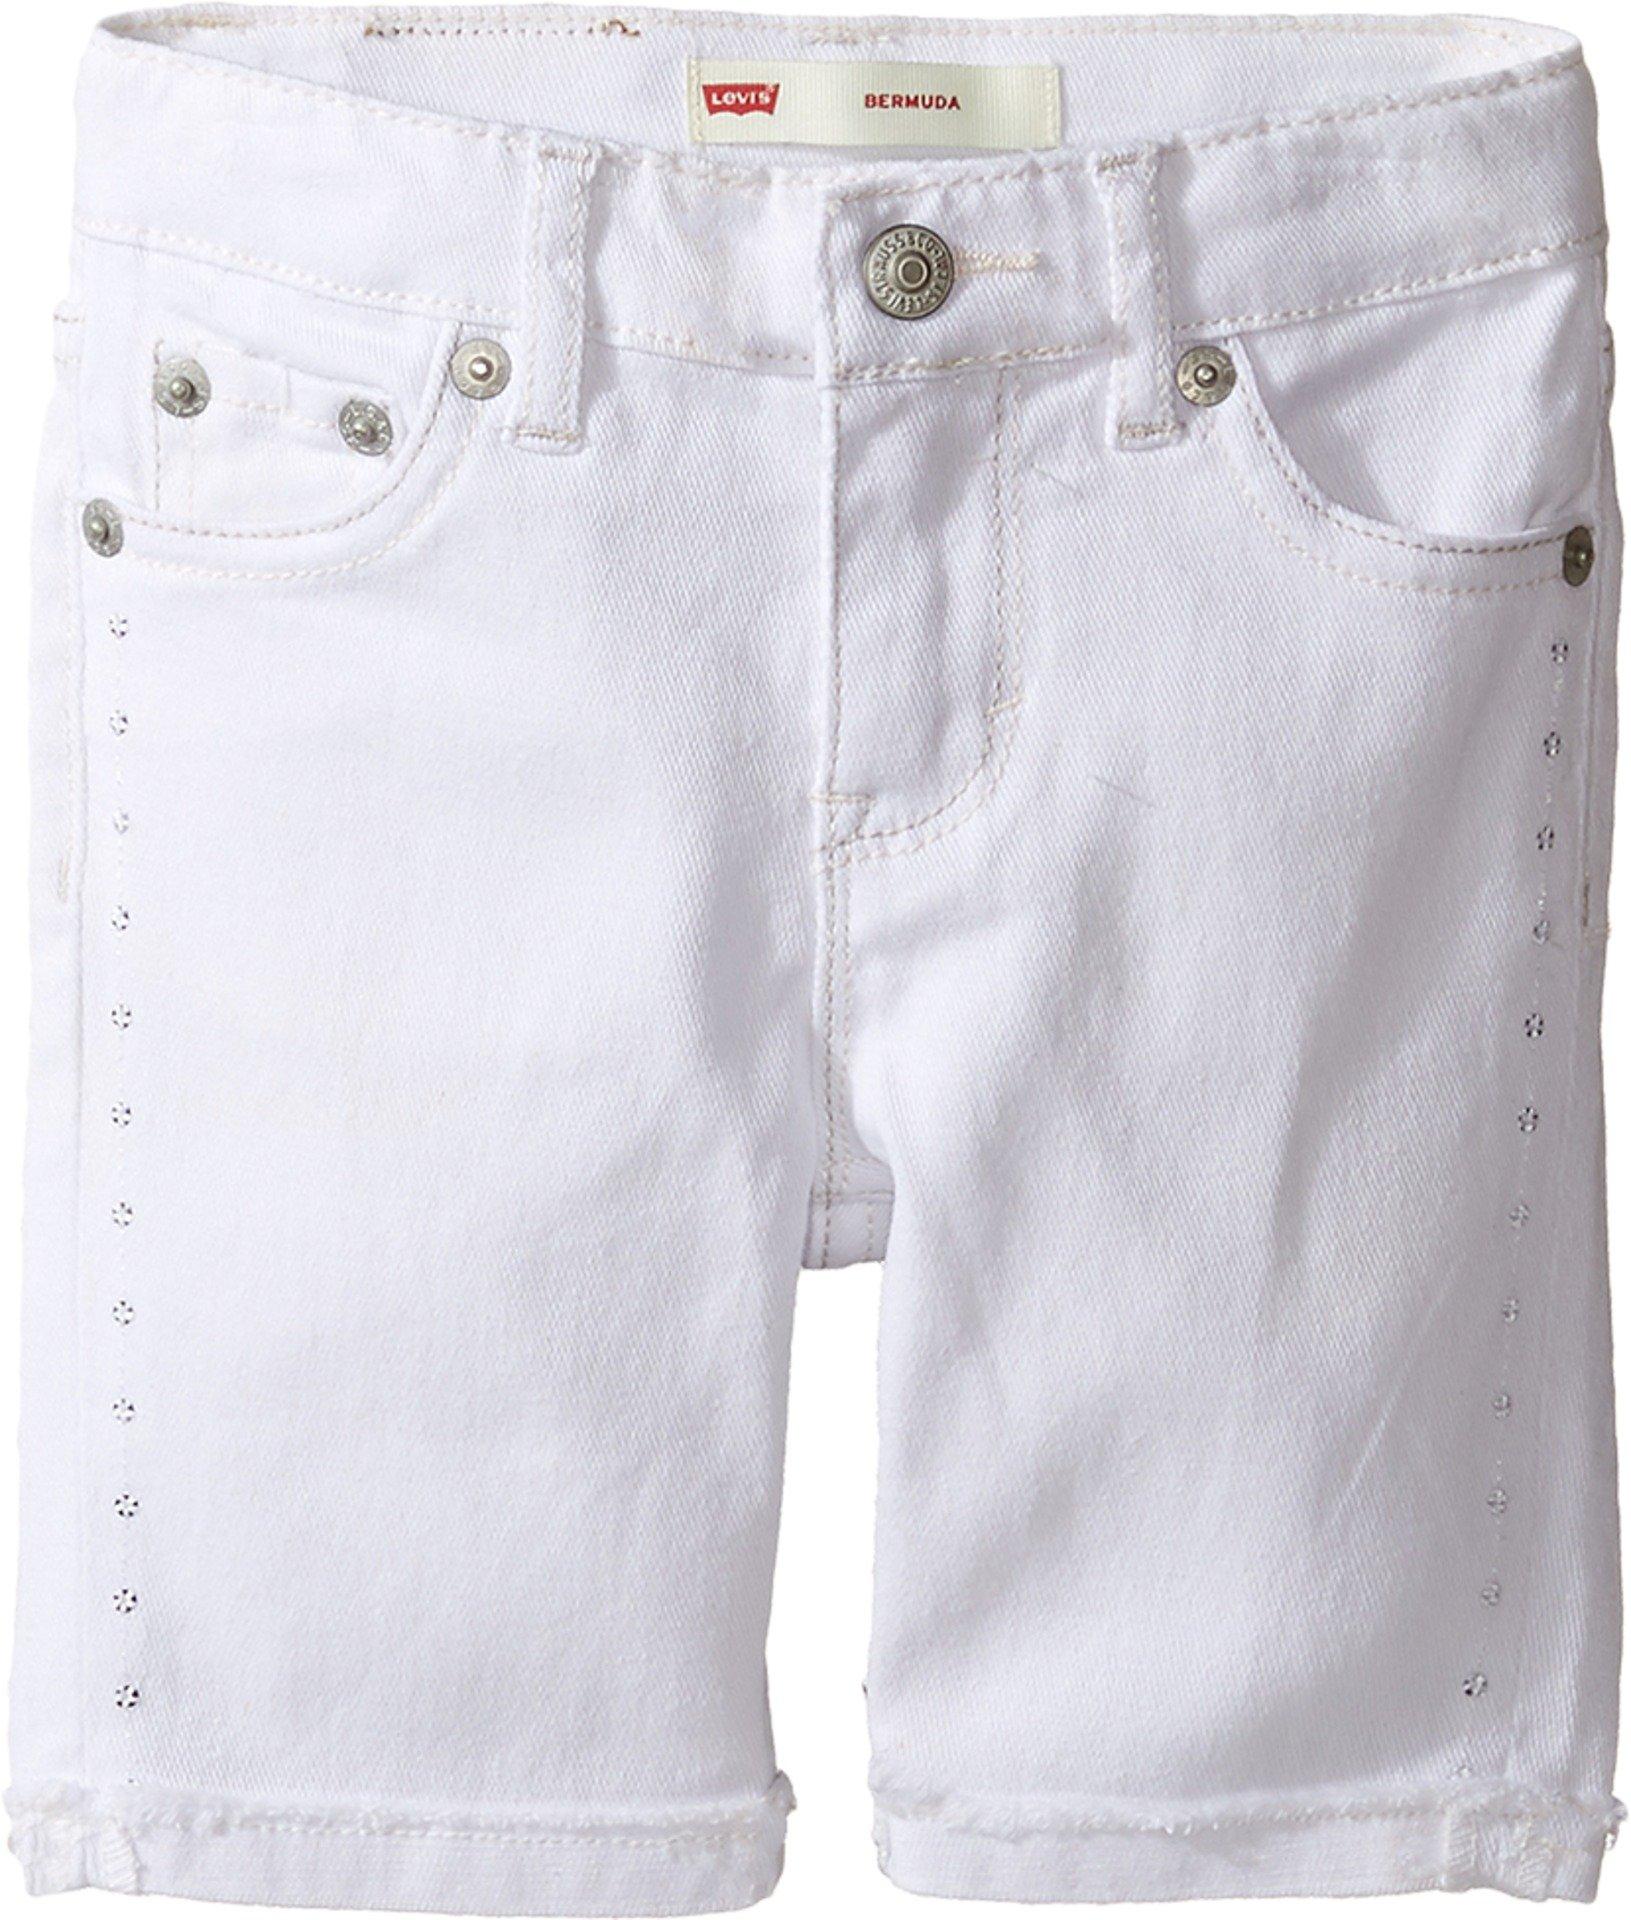 Levi's Kids Baby Girl's Sideseam Bermuda Shorts (Toddler) White Shorts by Levi's (Image #1)